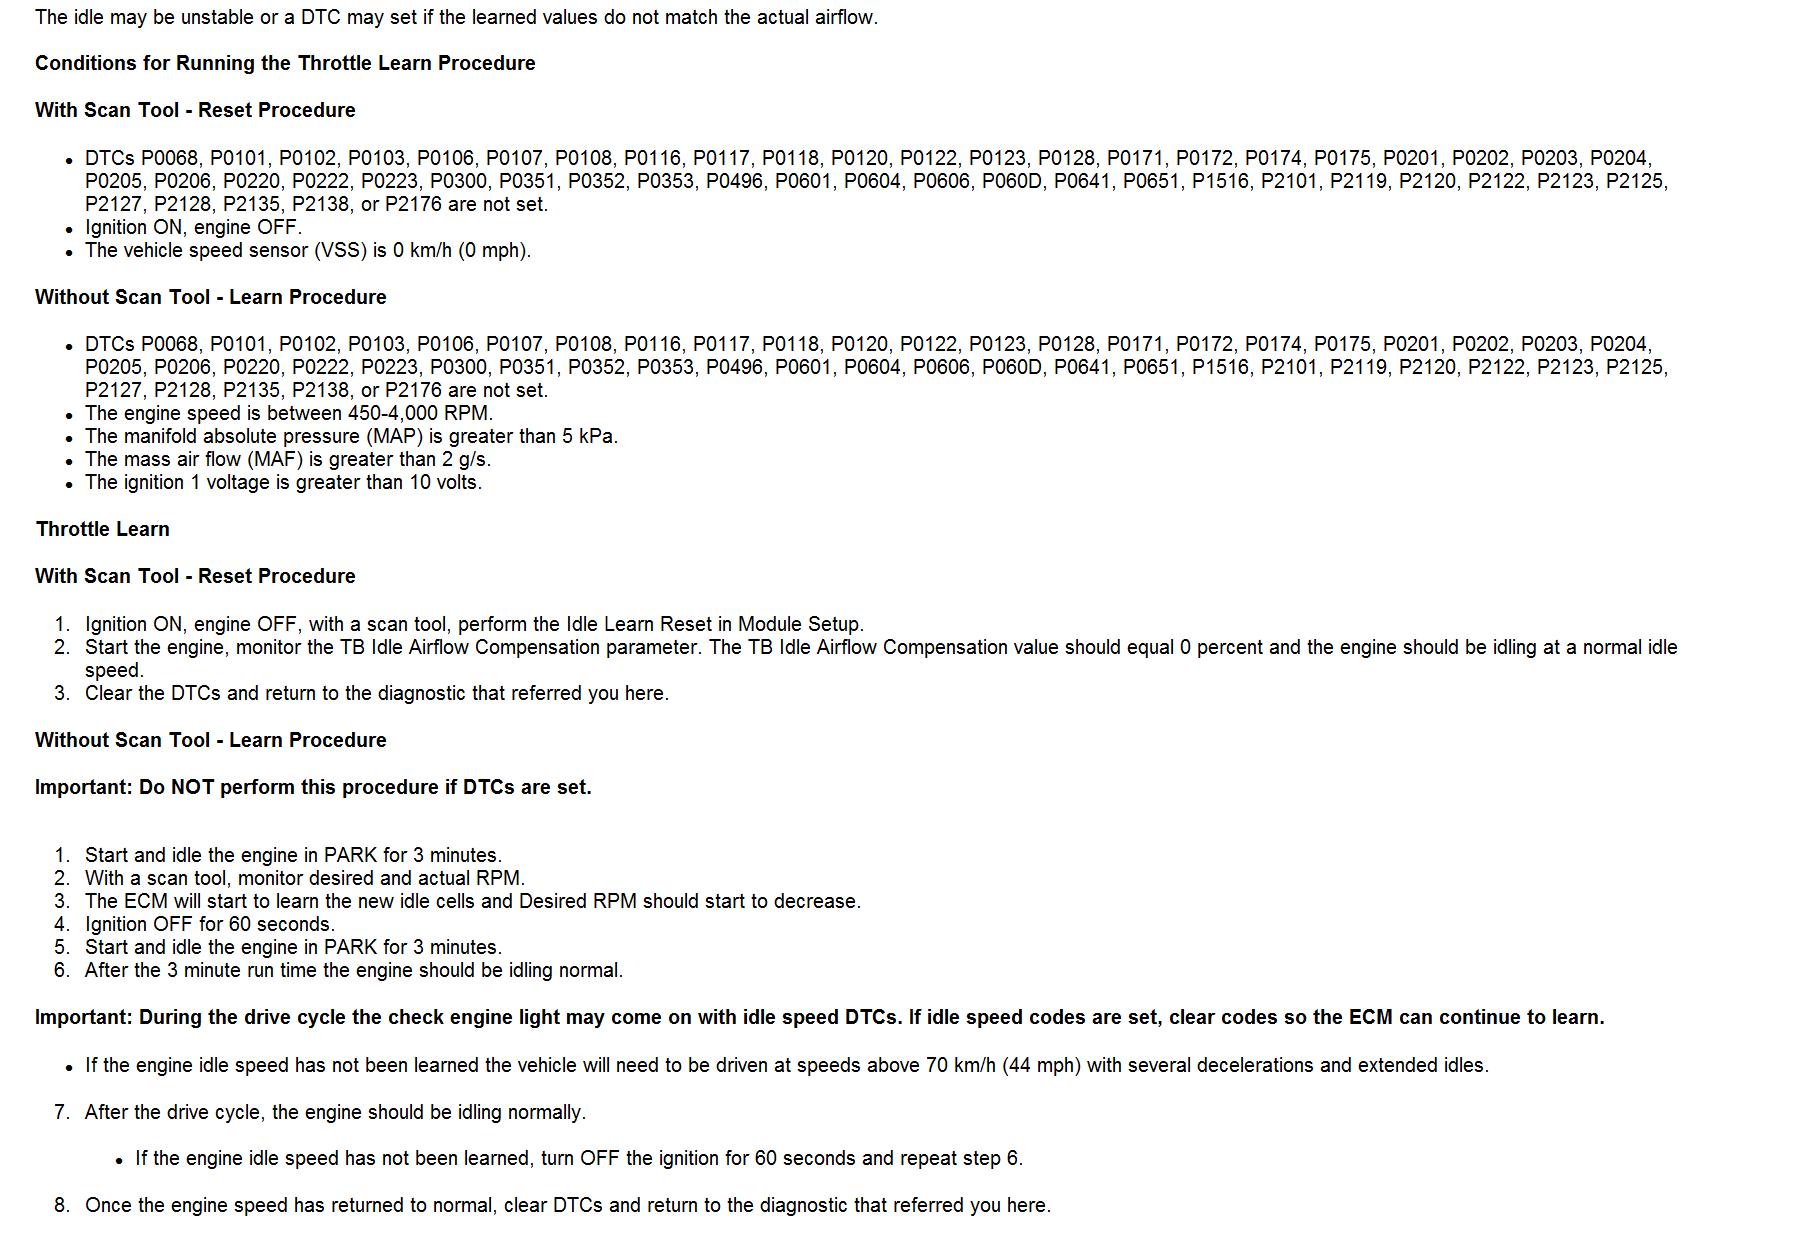 2002 jeep liberty owners manual pdf